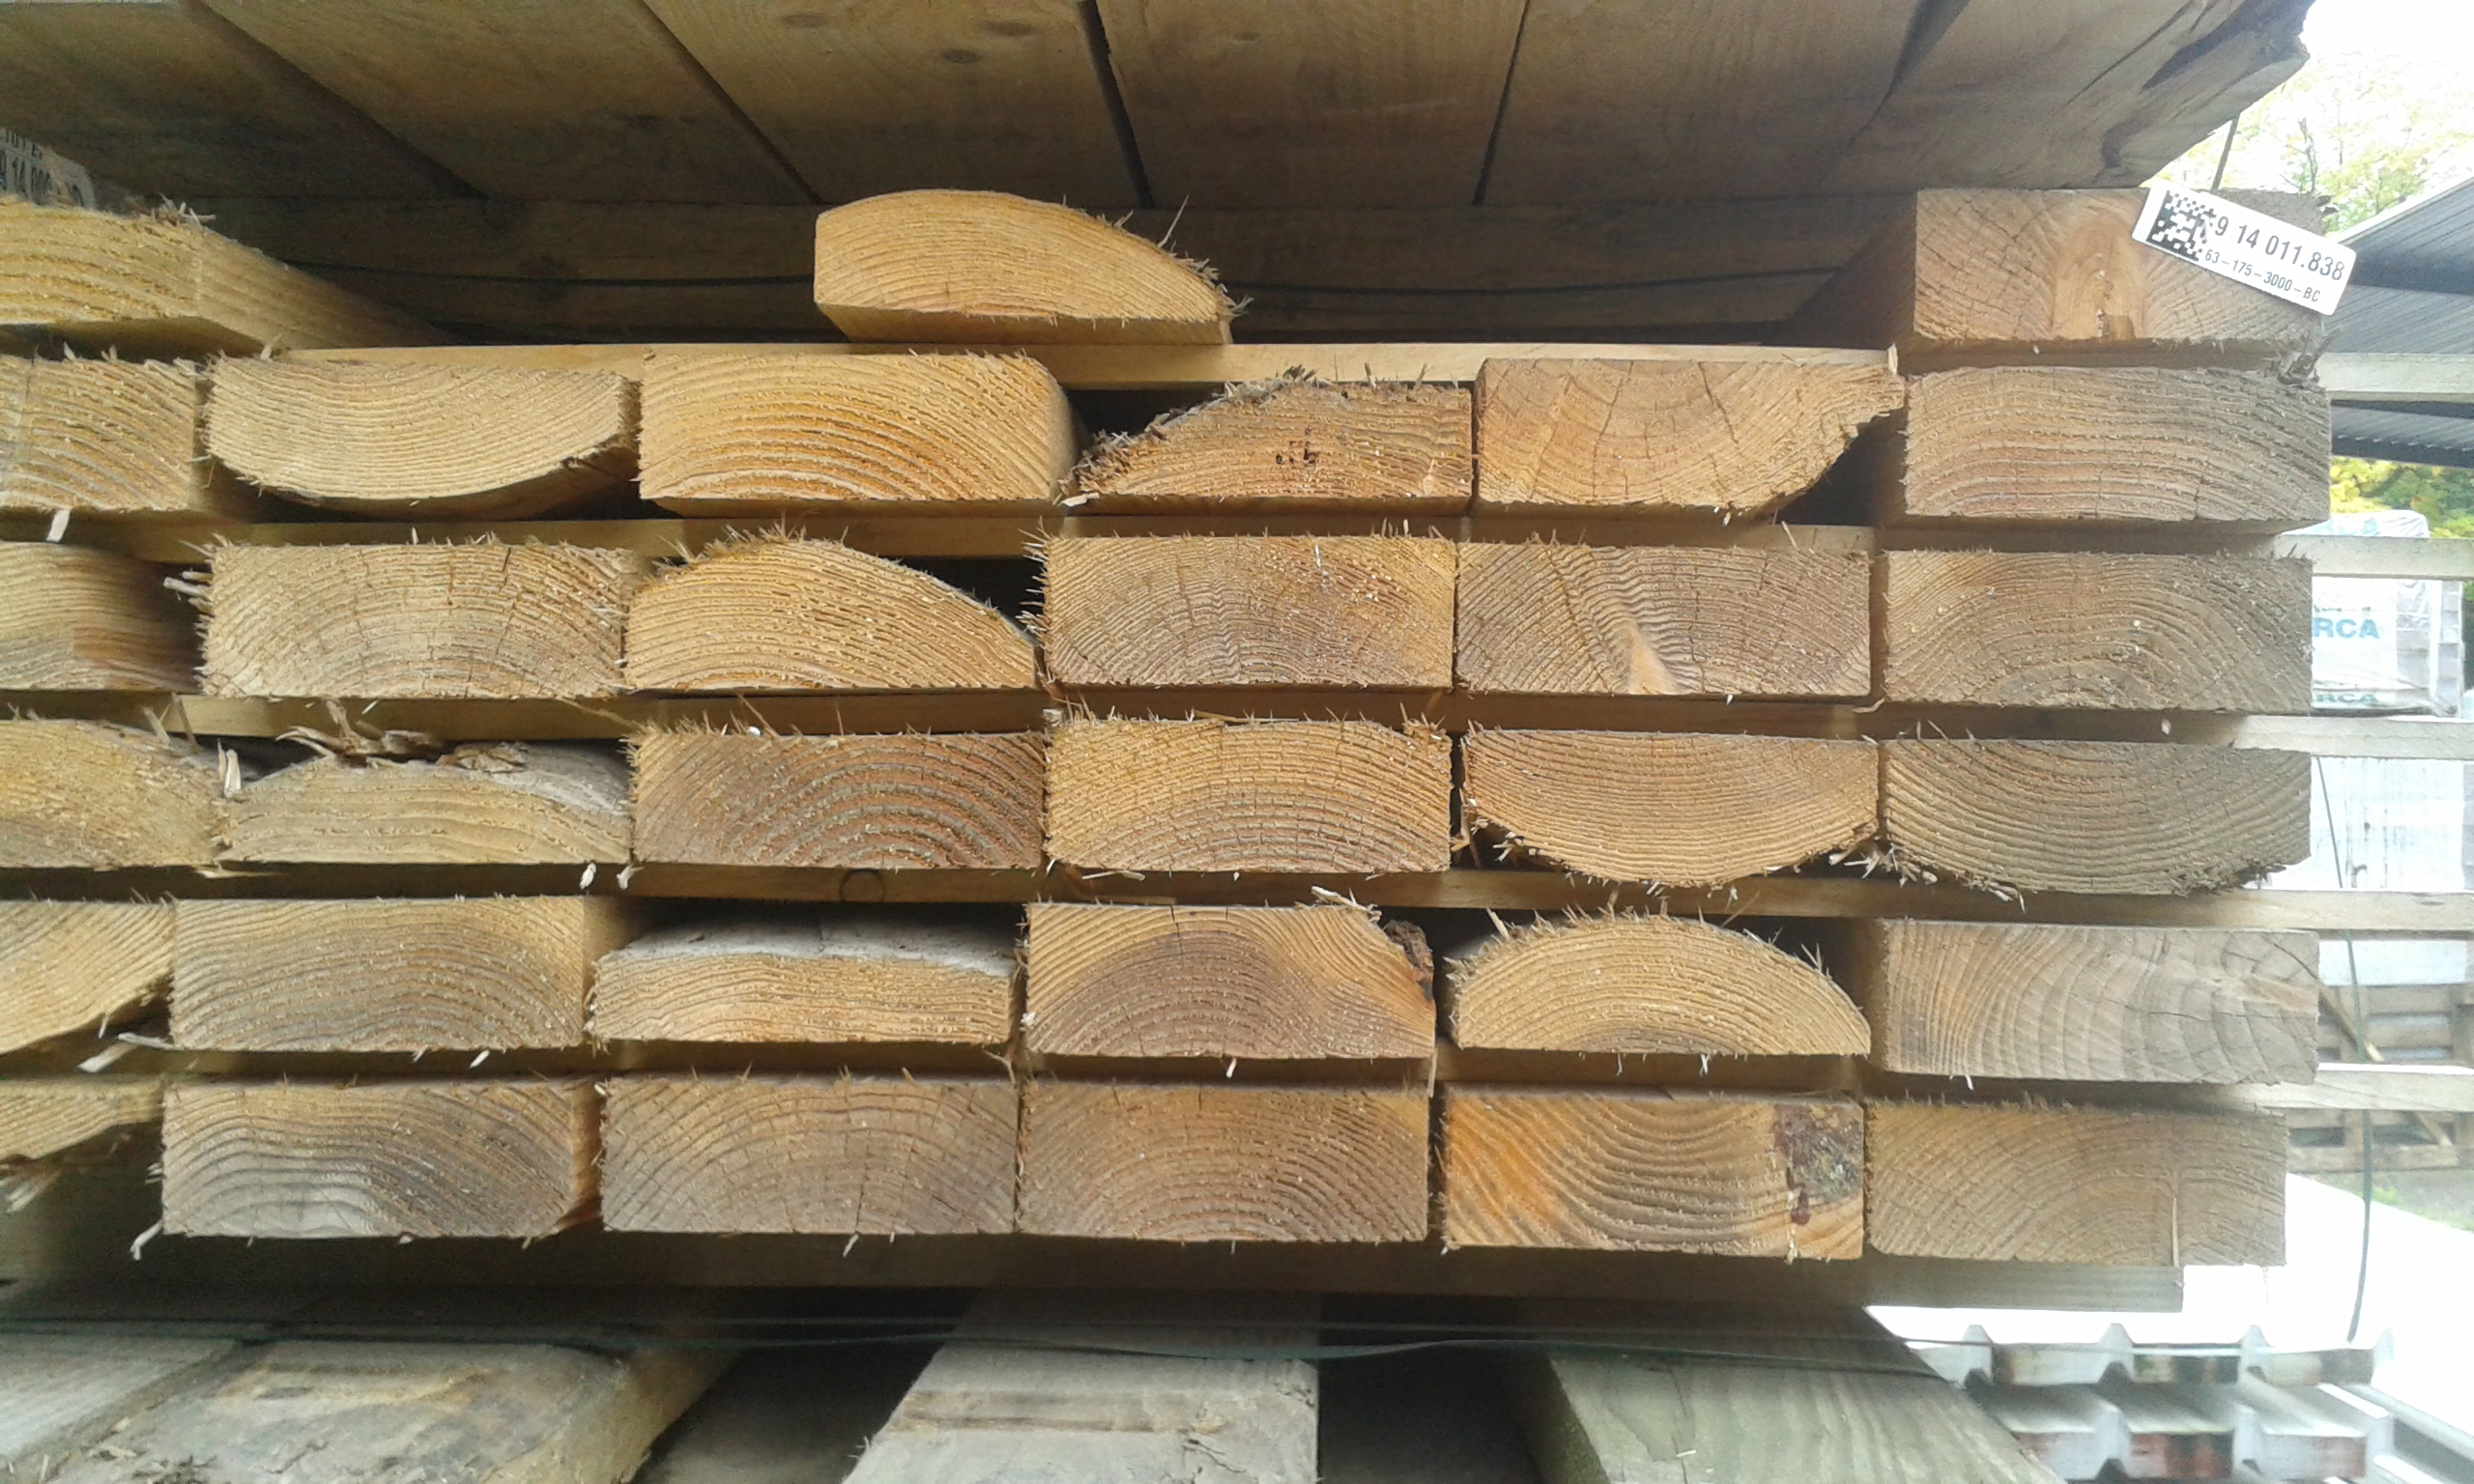 HOUTEN BALKEN 5,1m - 7x18 cm.en 7x15 cm - loten